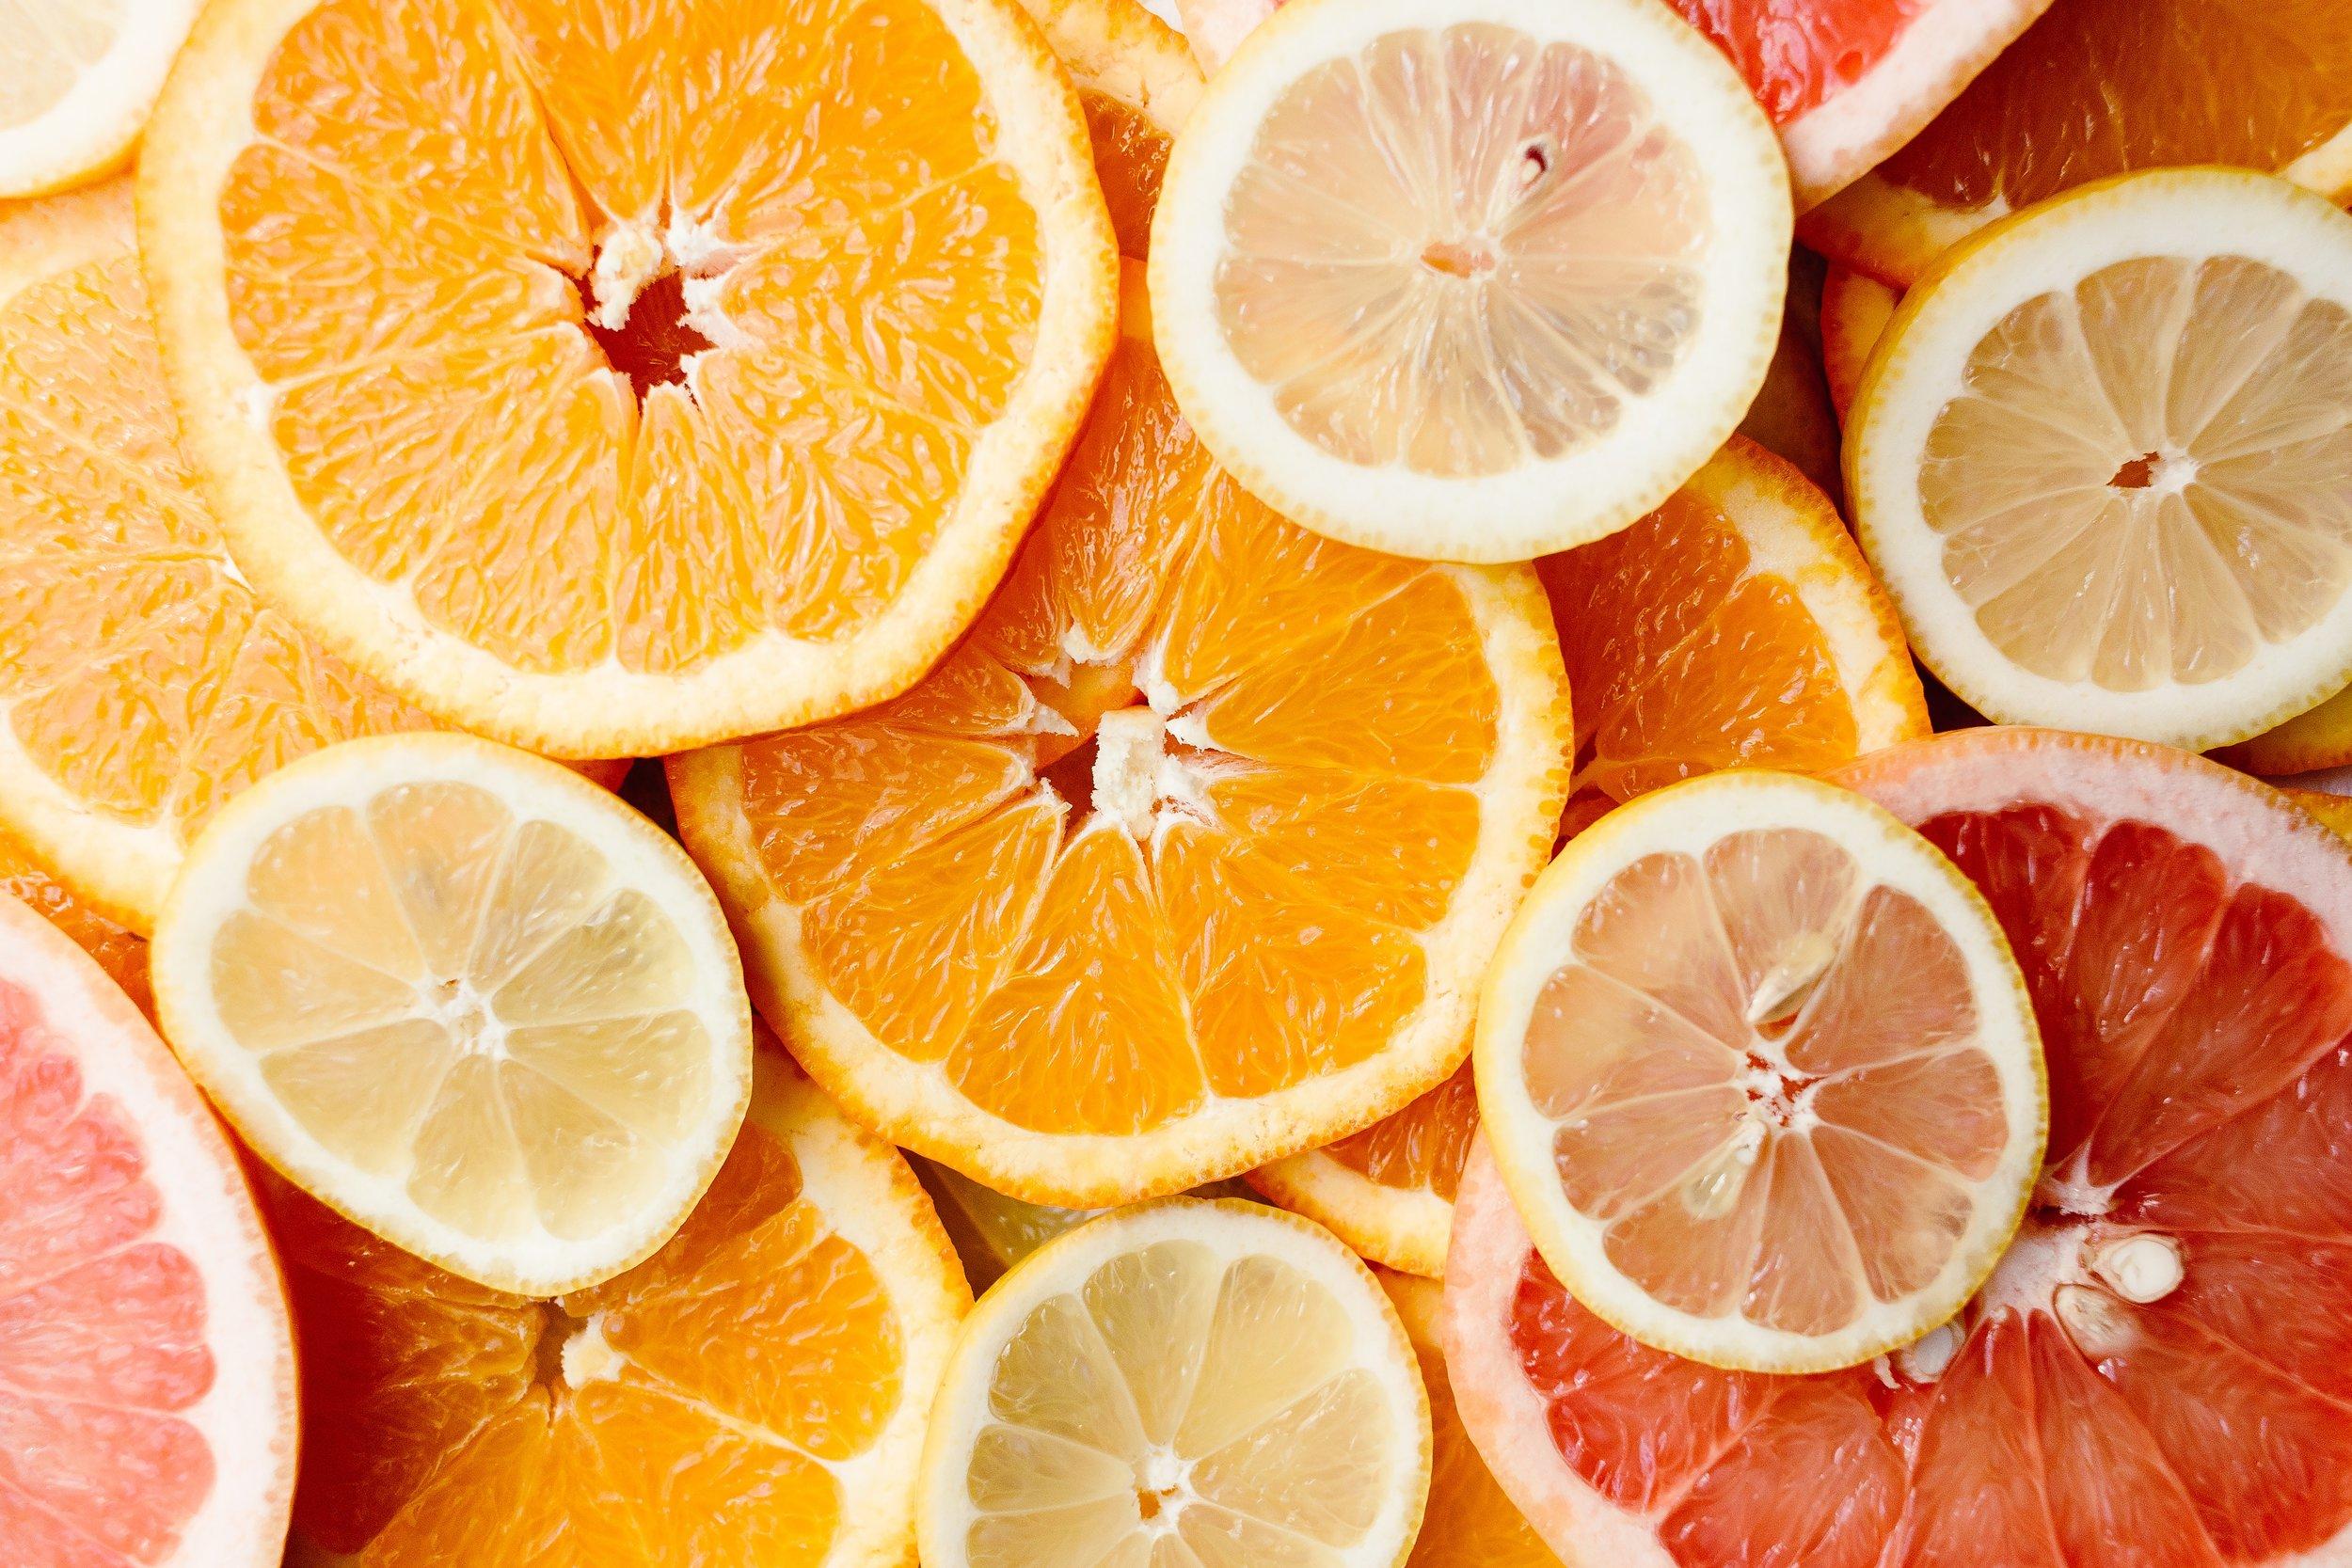 citrus-close-up-cut-1002778.jpg